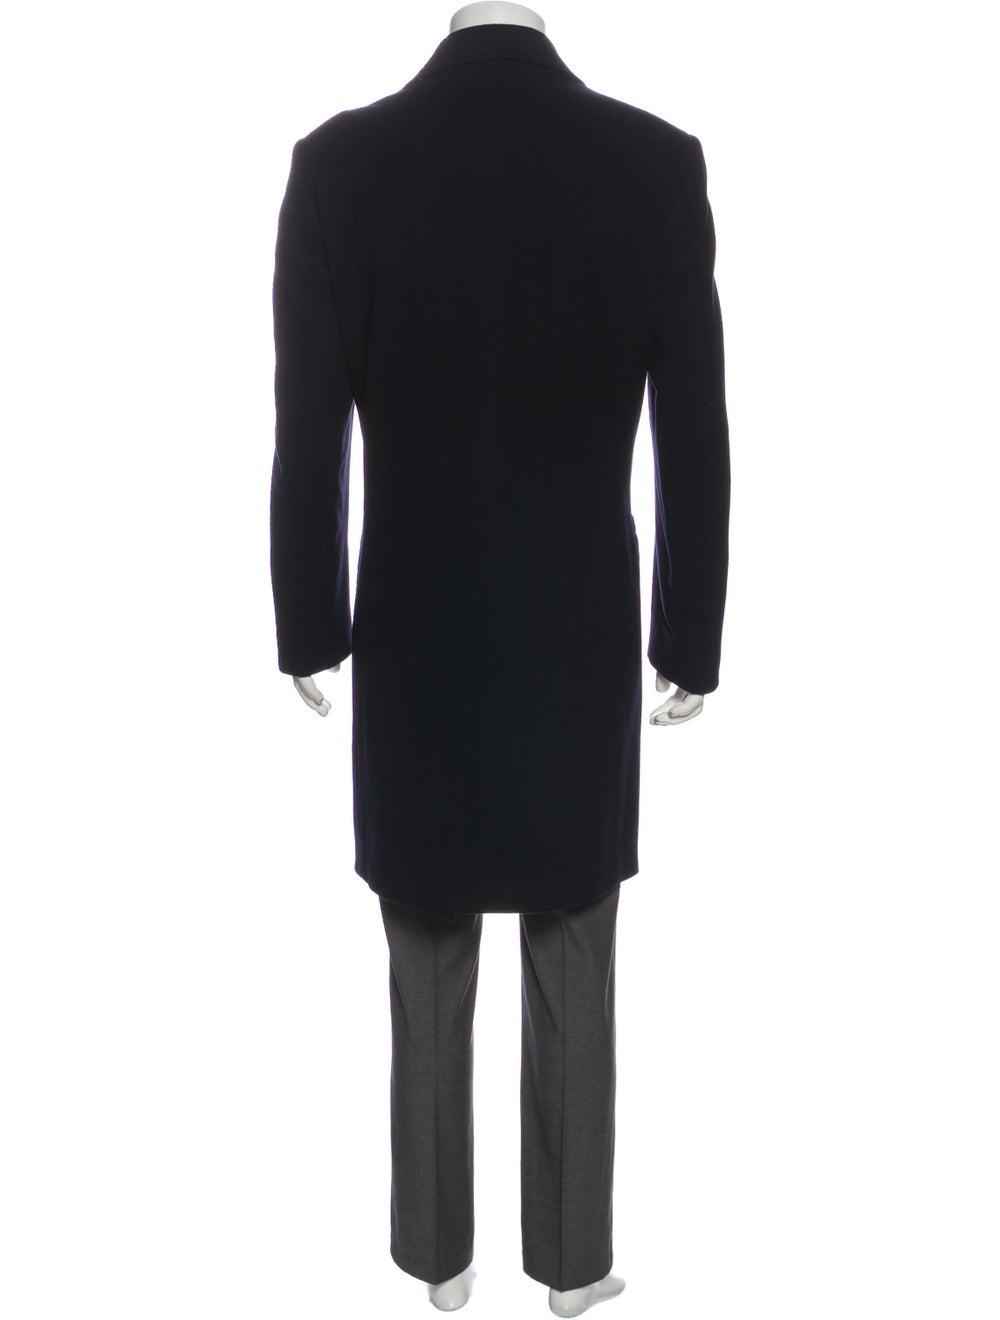 Manrico Cashmere Cashmere Overcoat Black - image 3